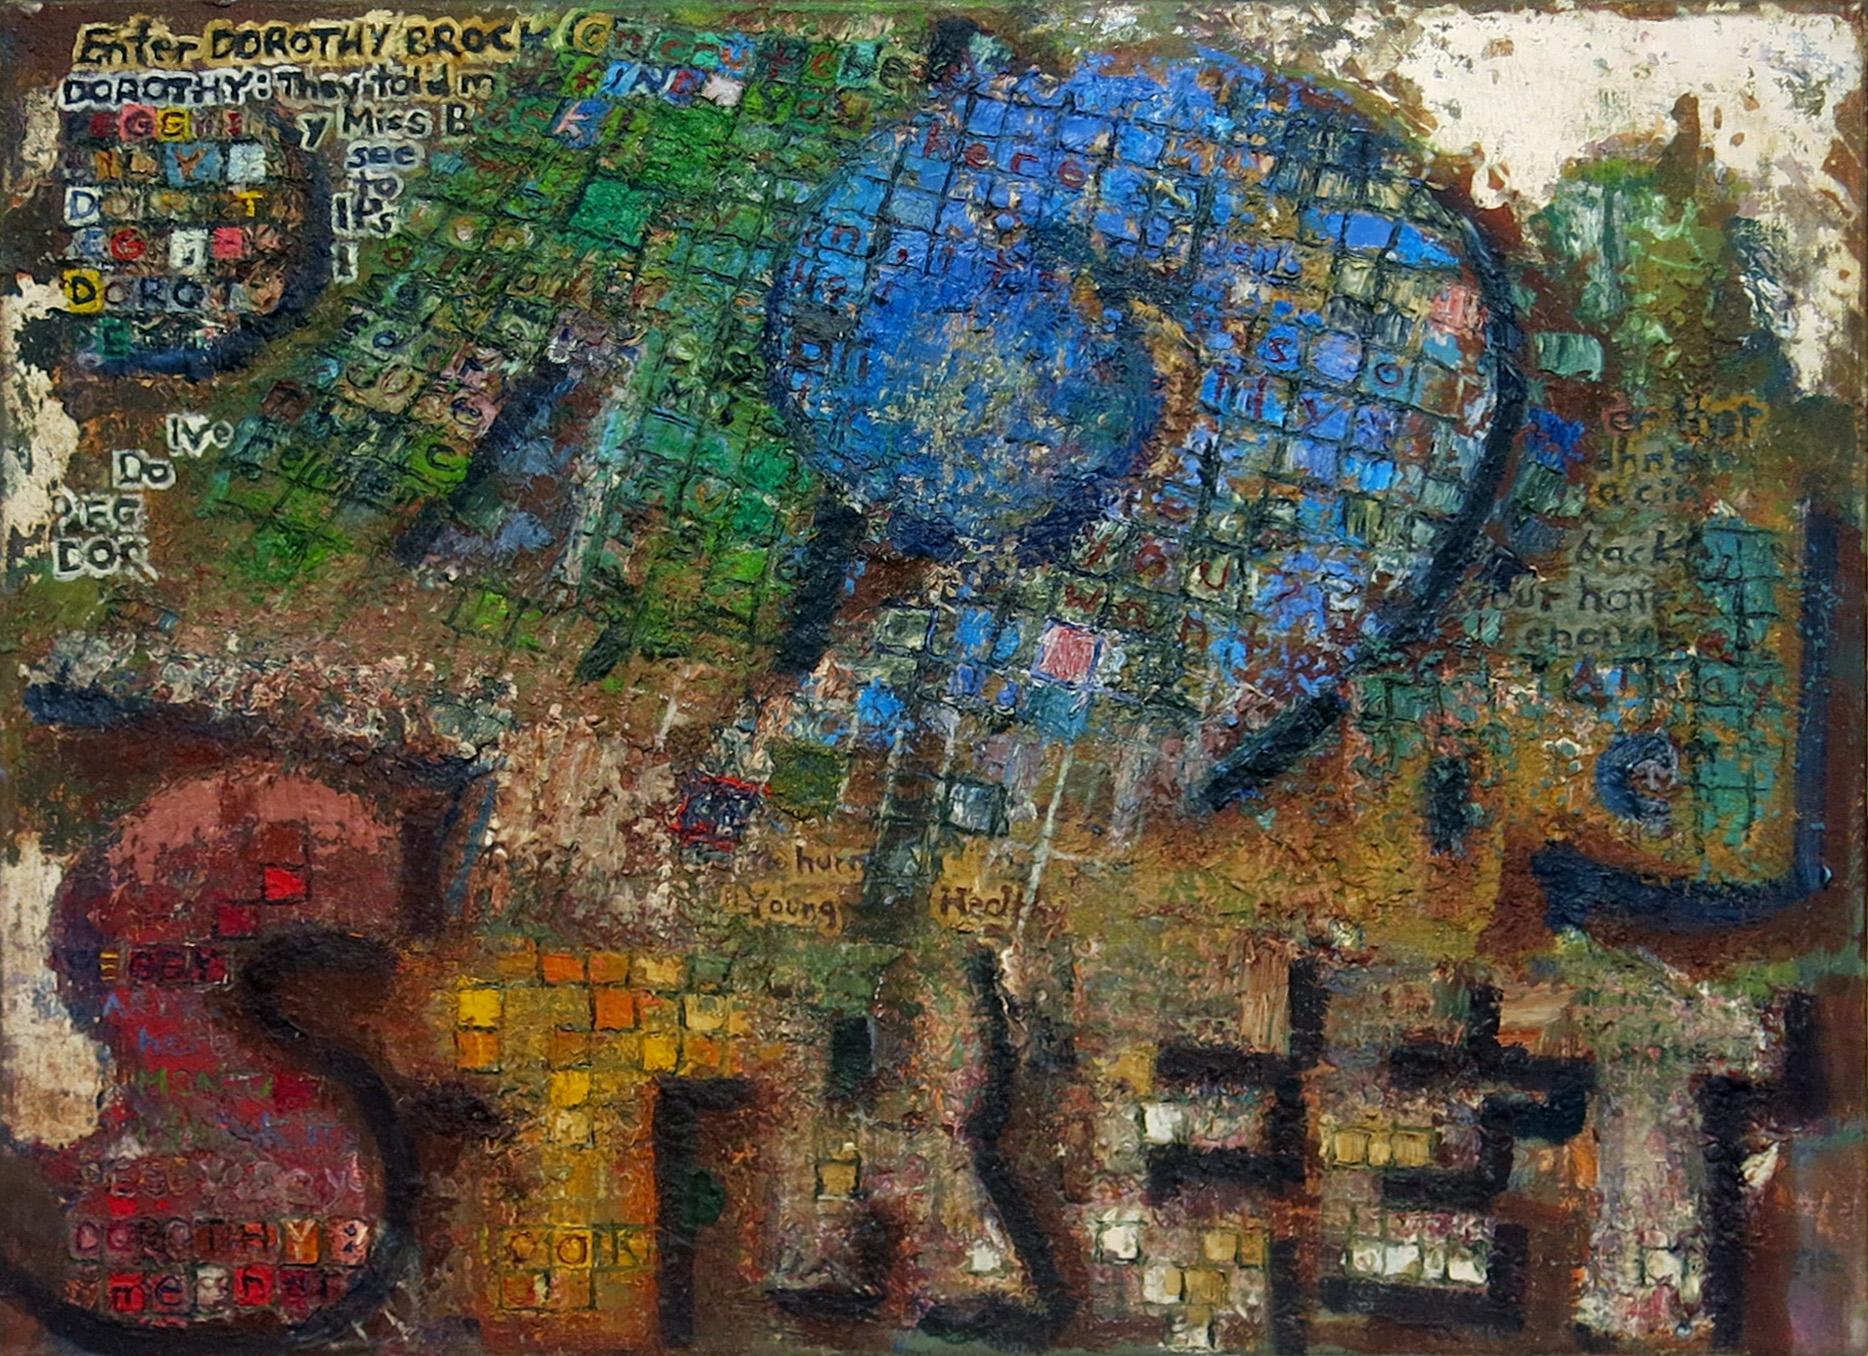 John Lees,  42nd Street (Tesserae) , 2015, oil on canvas, 24h x 32w in.